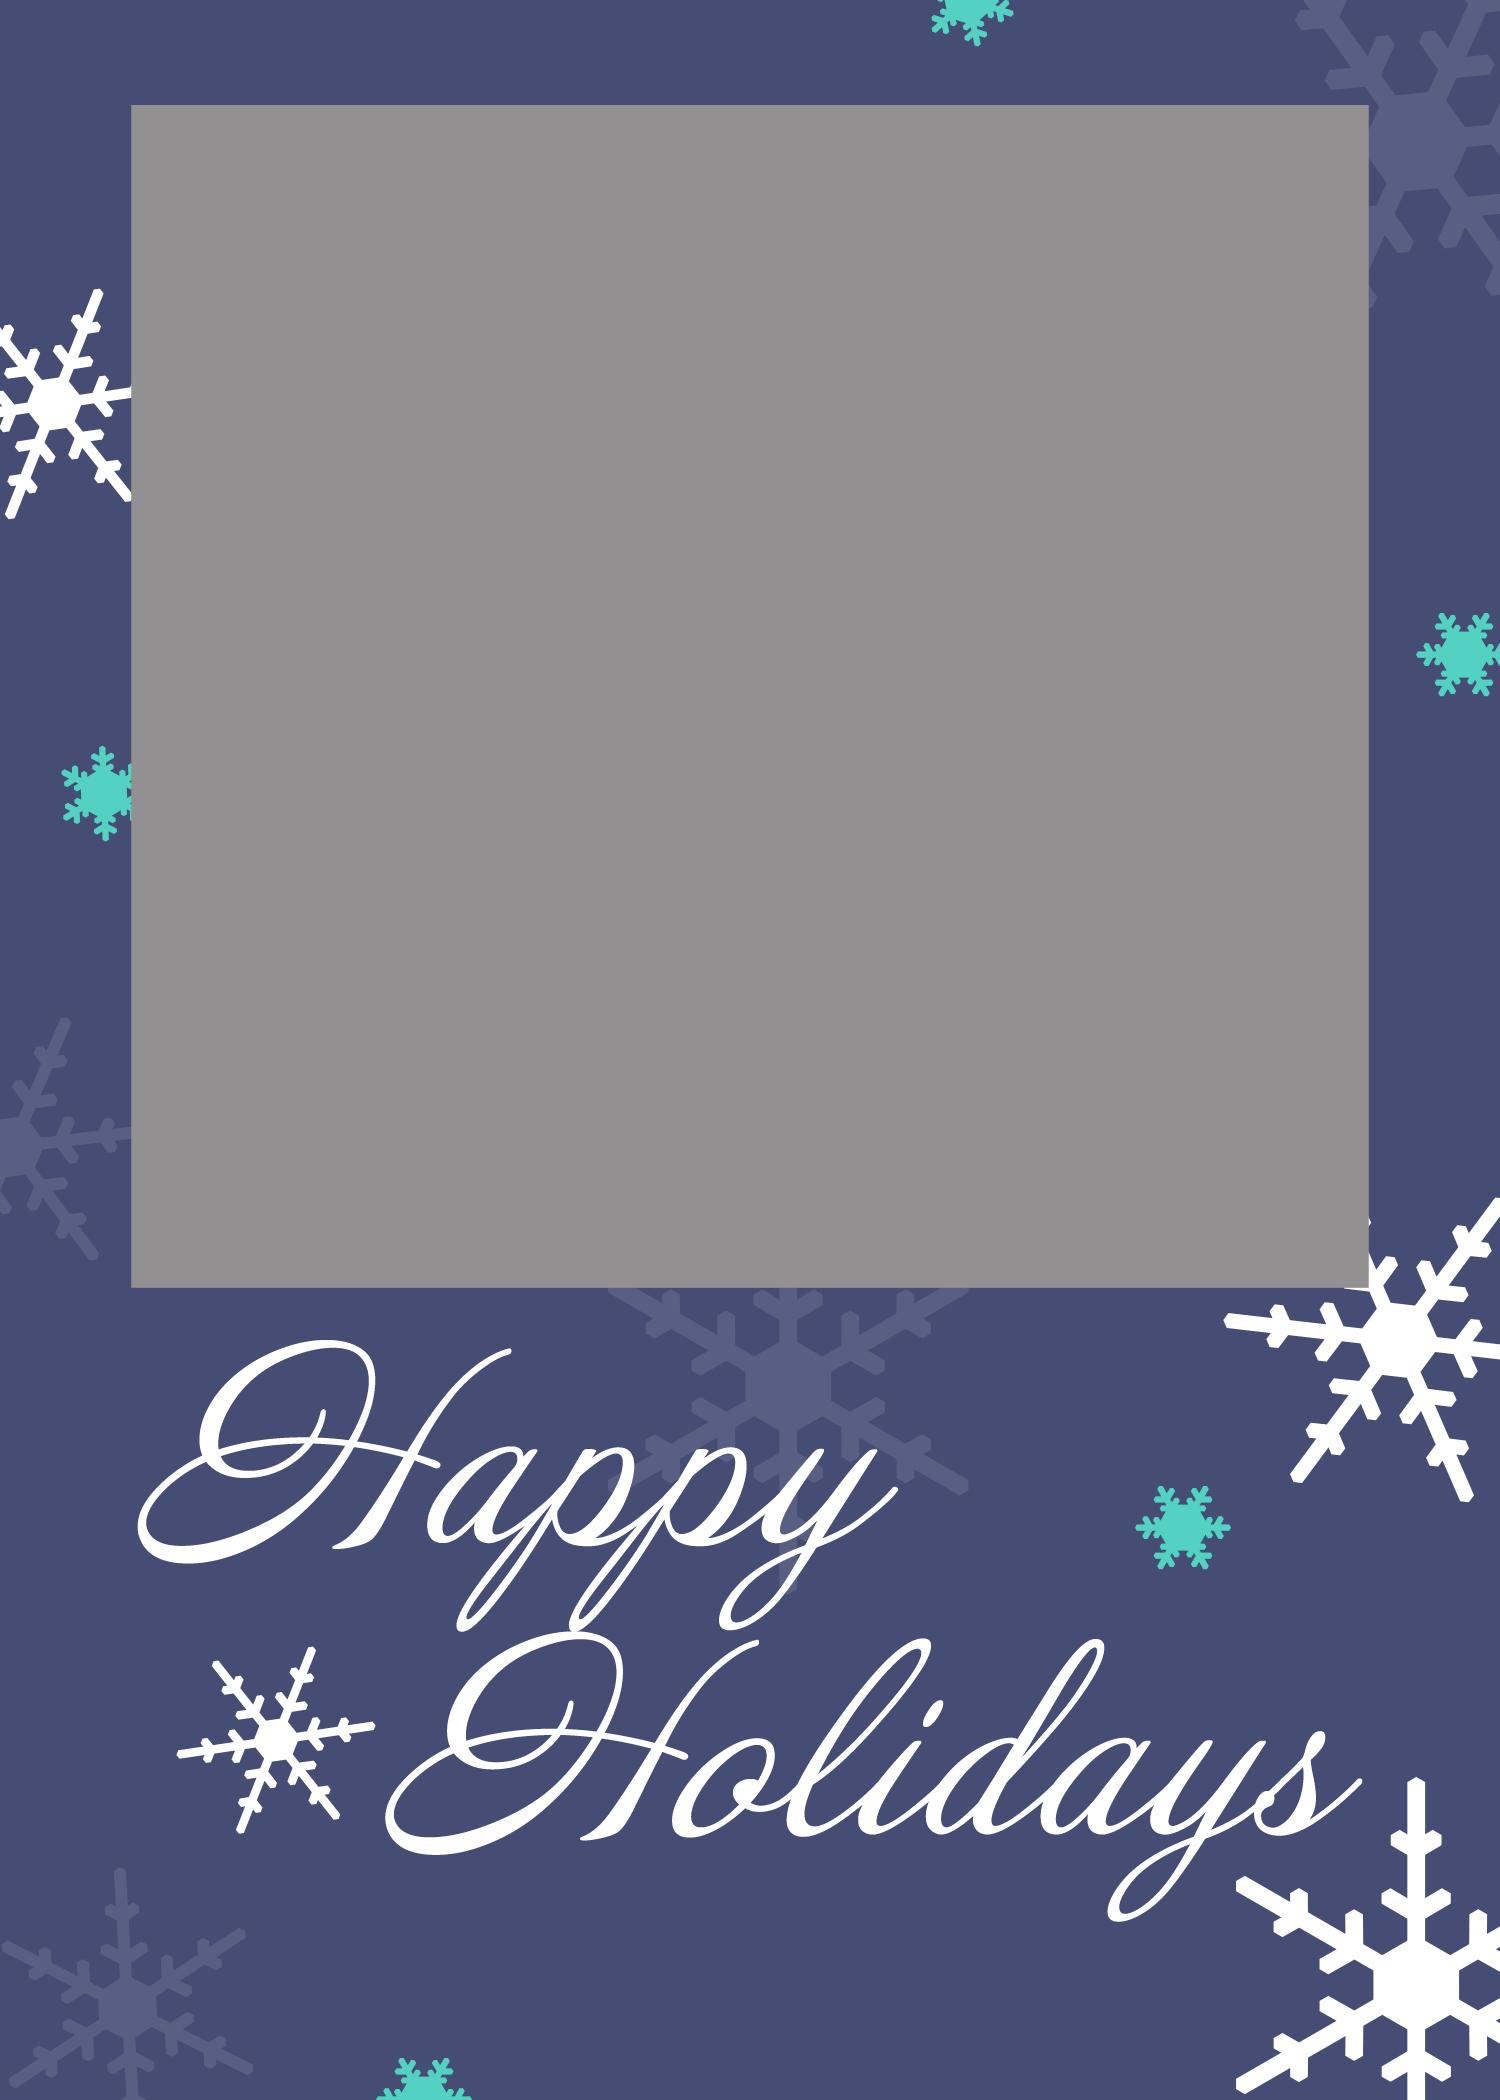 Free Printable Christmas Card Templates Images  Free Printable In Free Holiday Photo Card Templates